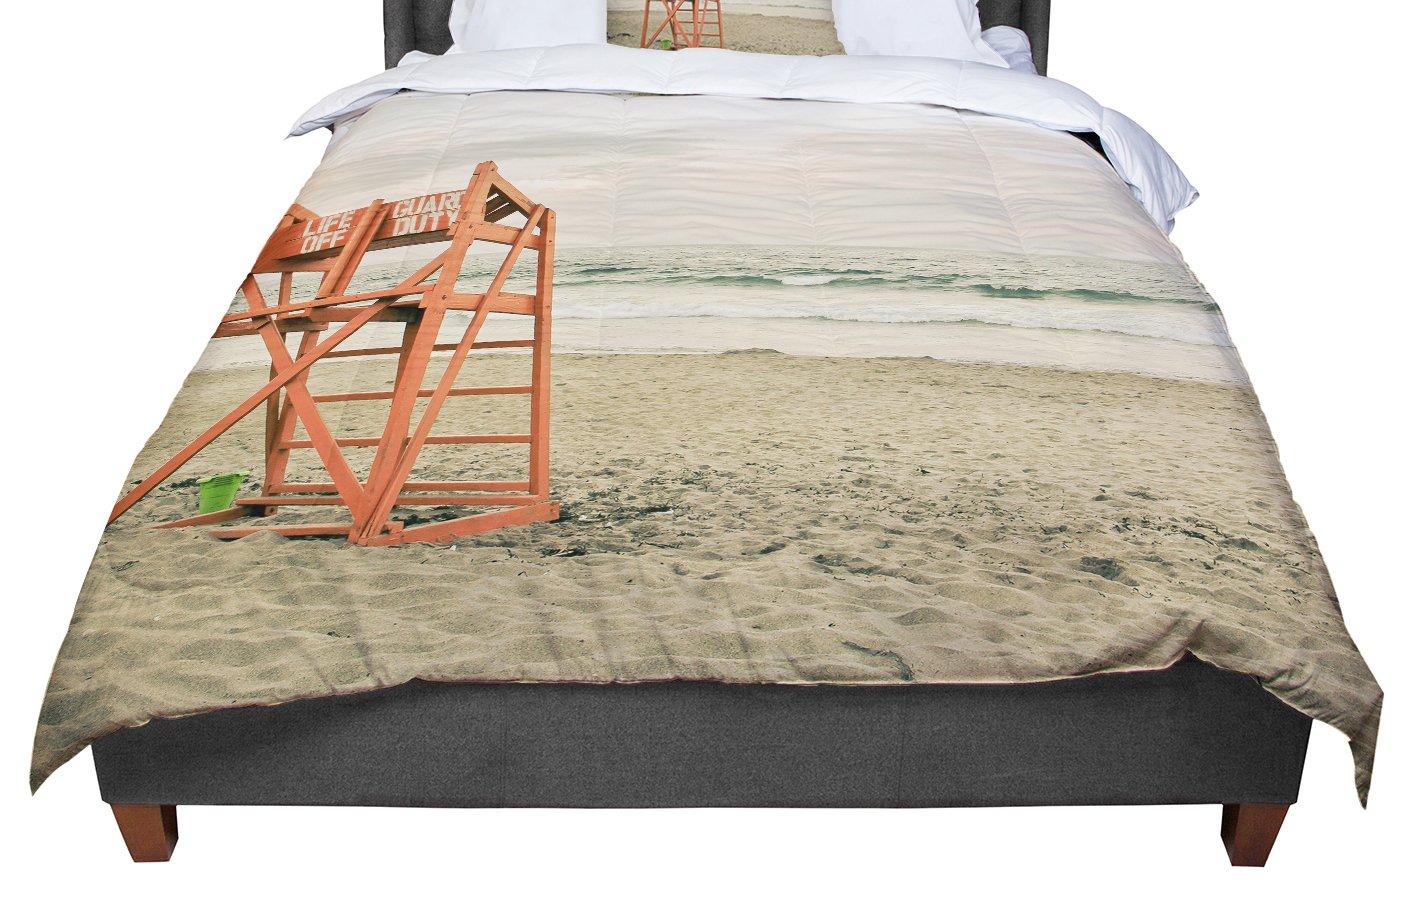 68 X 88 KESS InHouse Debbra Obertanec Dusk At The Beach Ocean Twin Comforter